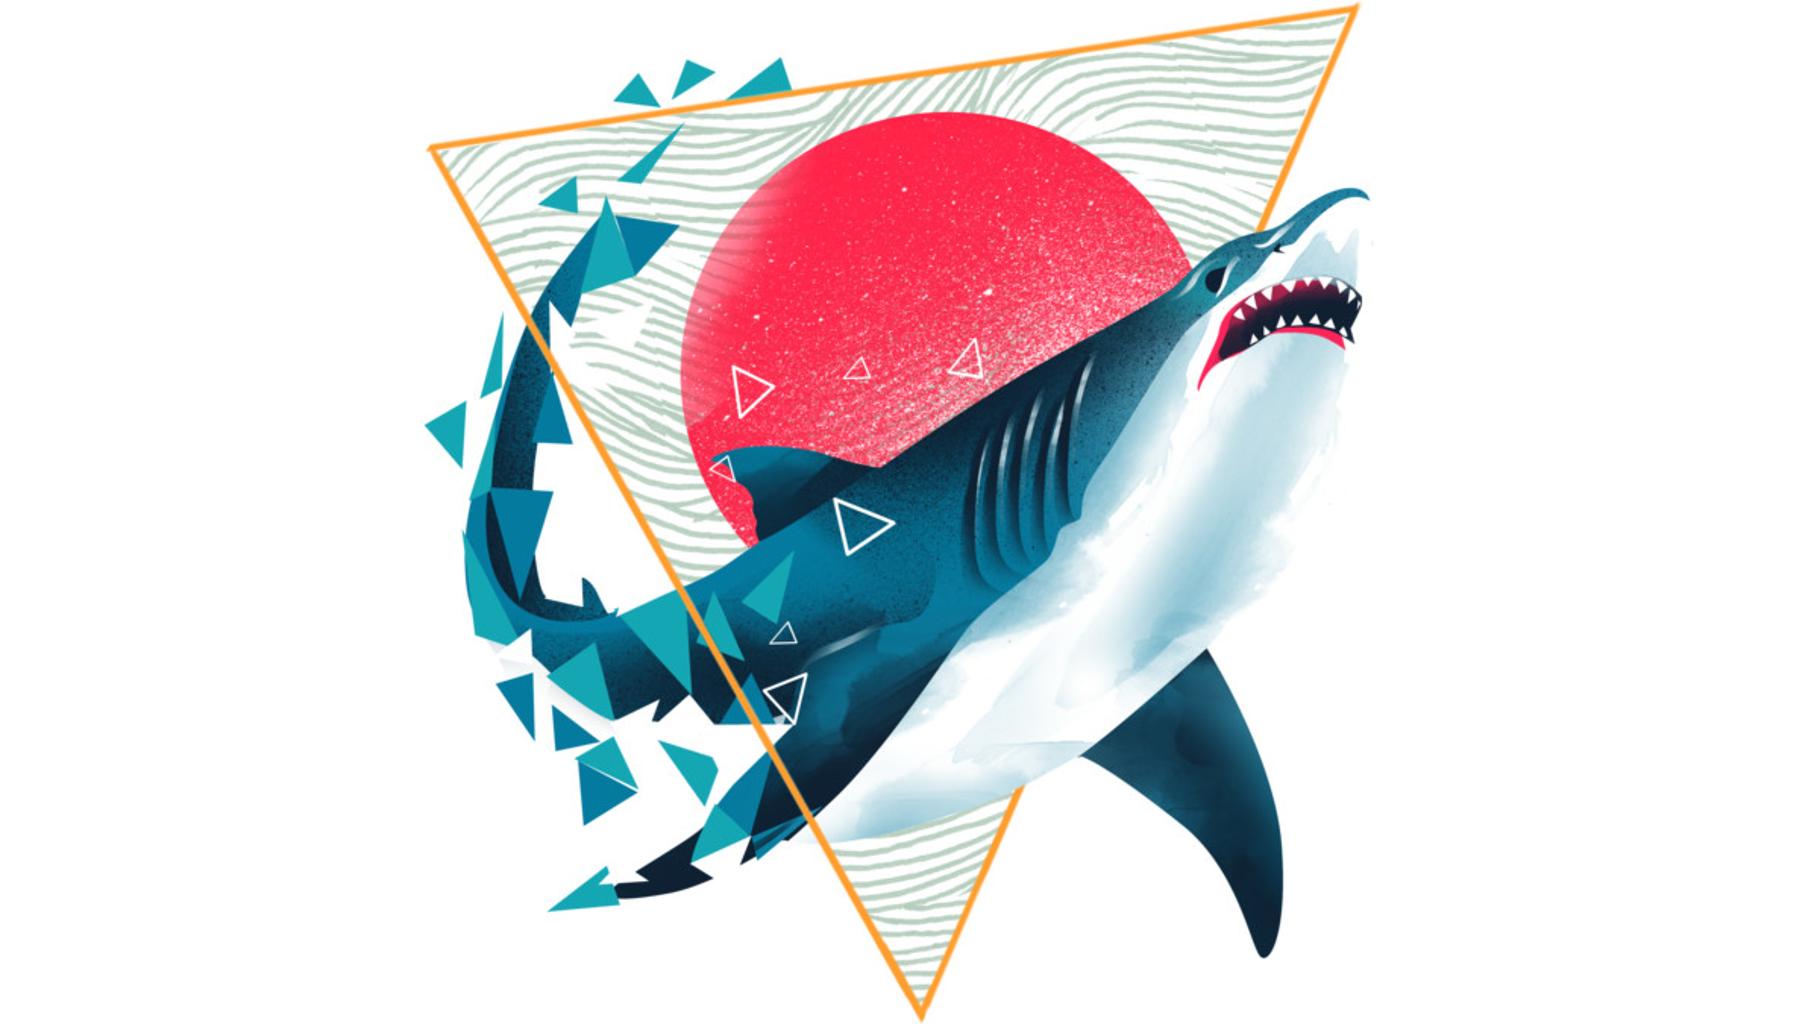 Design by Humans: Geometric Shark